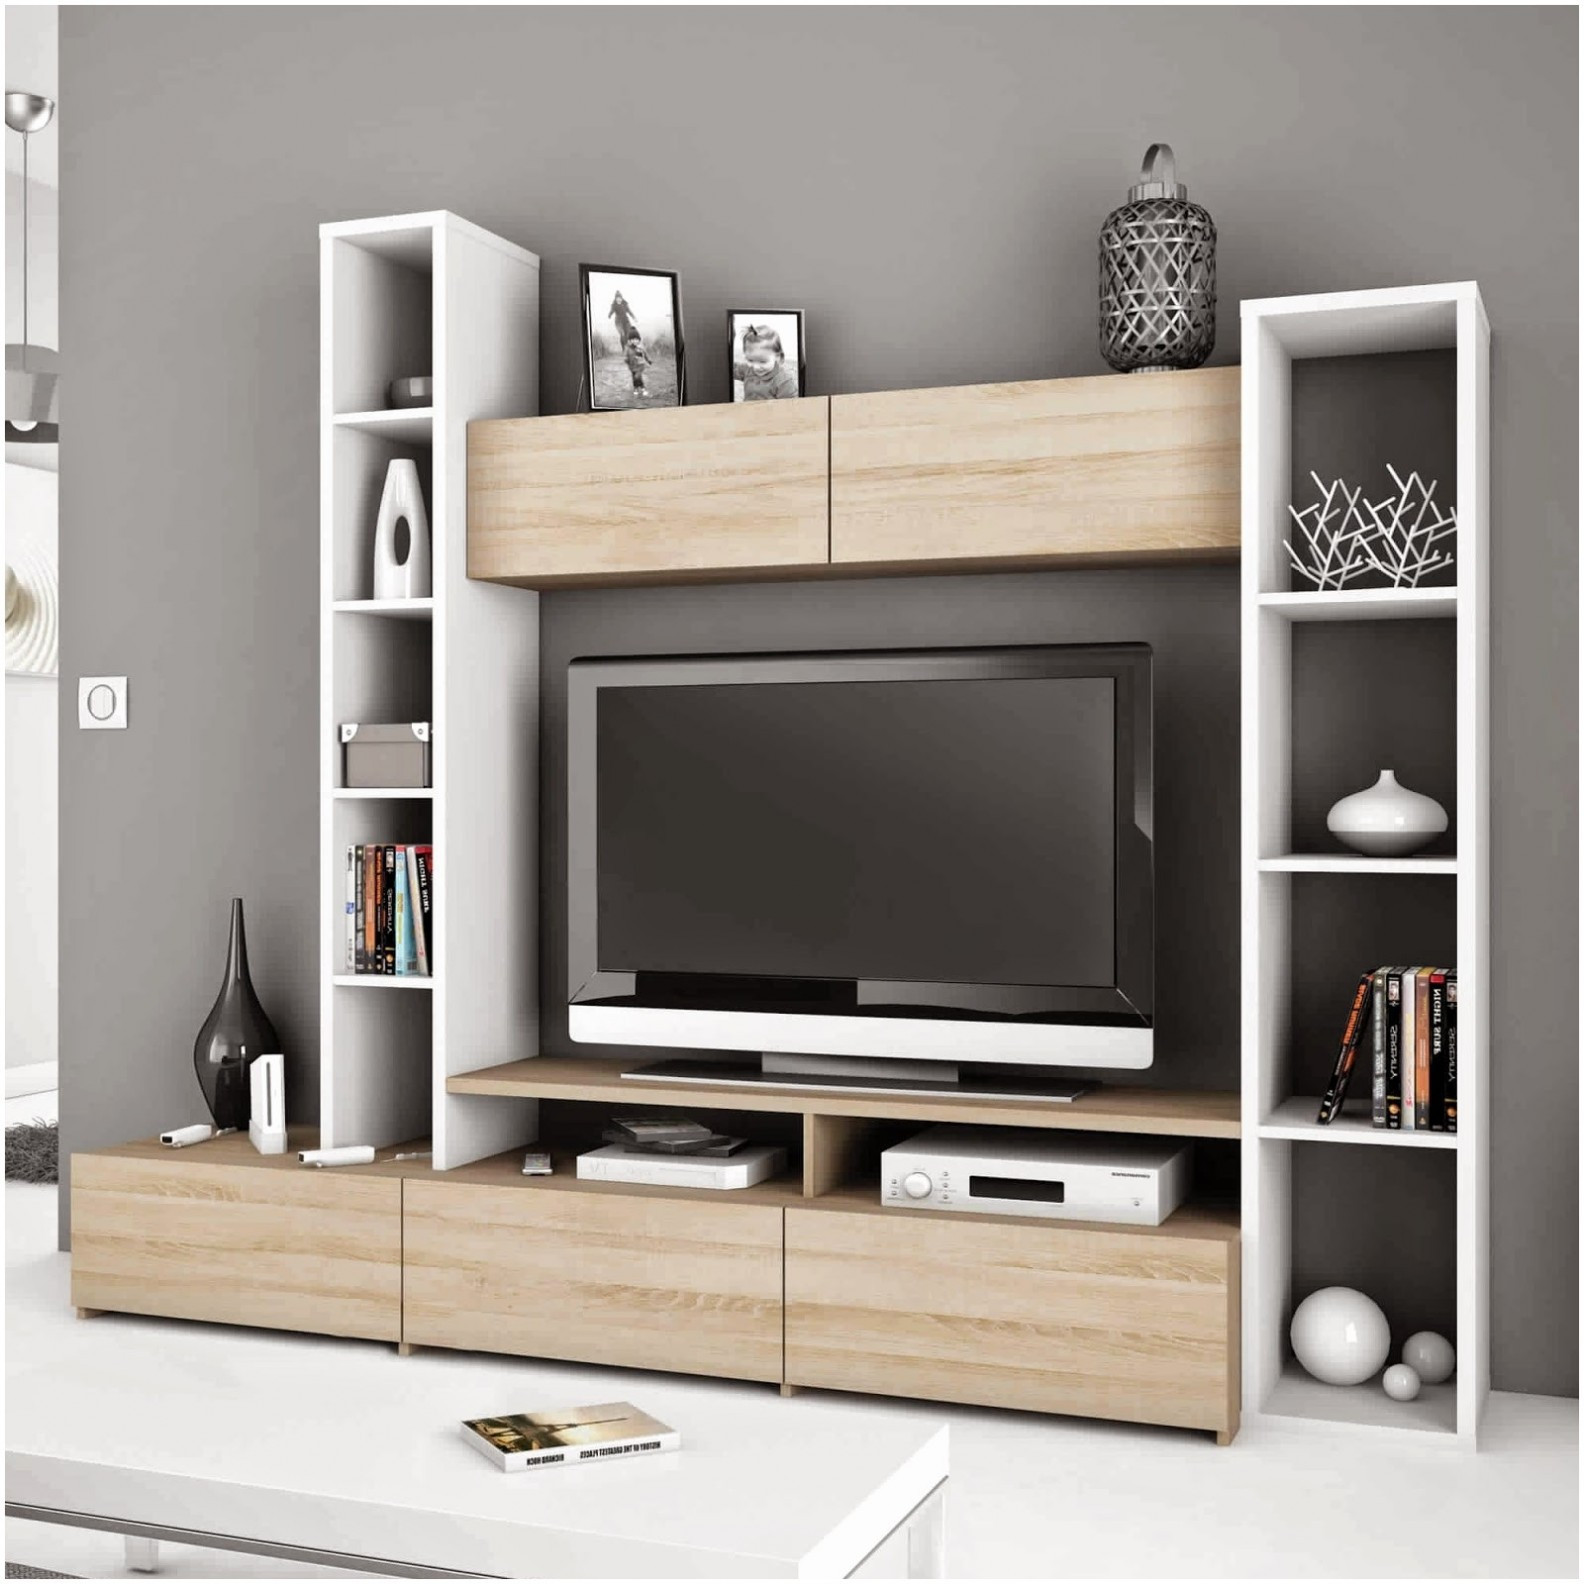 cdiscount meuble tele lesmeubles meuble tv blanc lesmeubles of cdiscount meuble tele